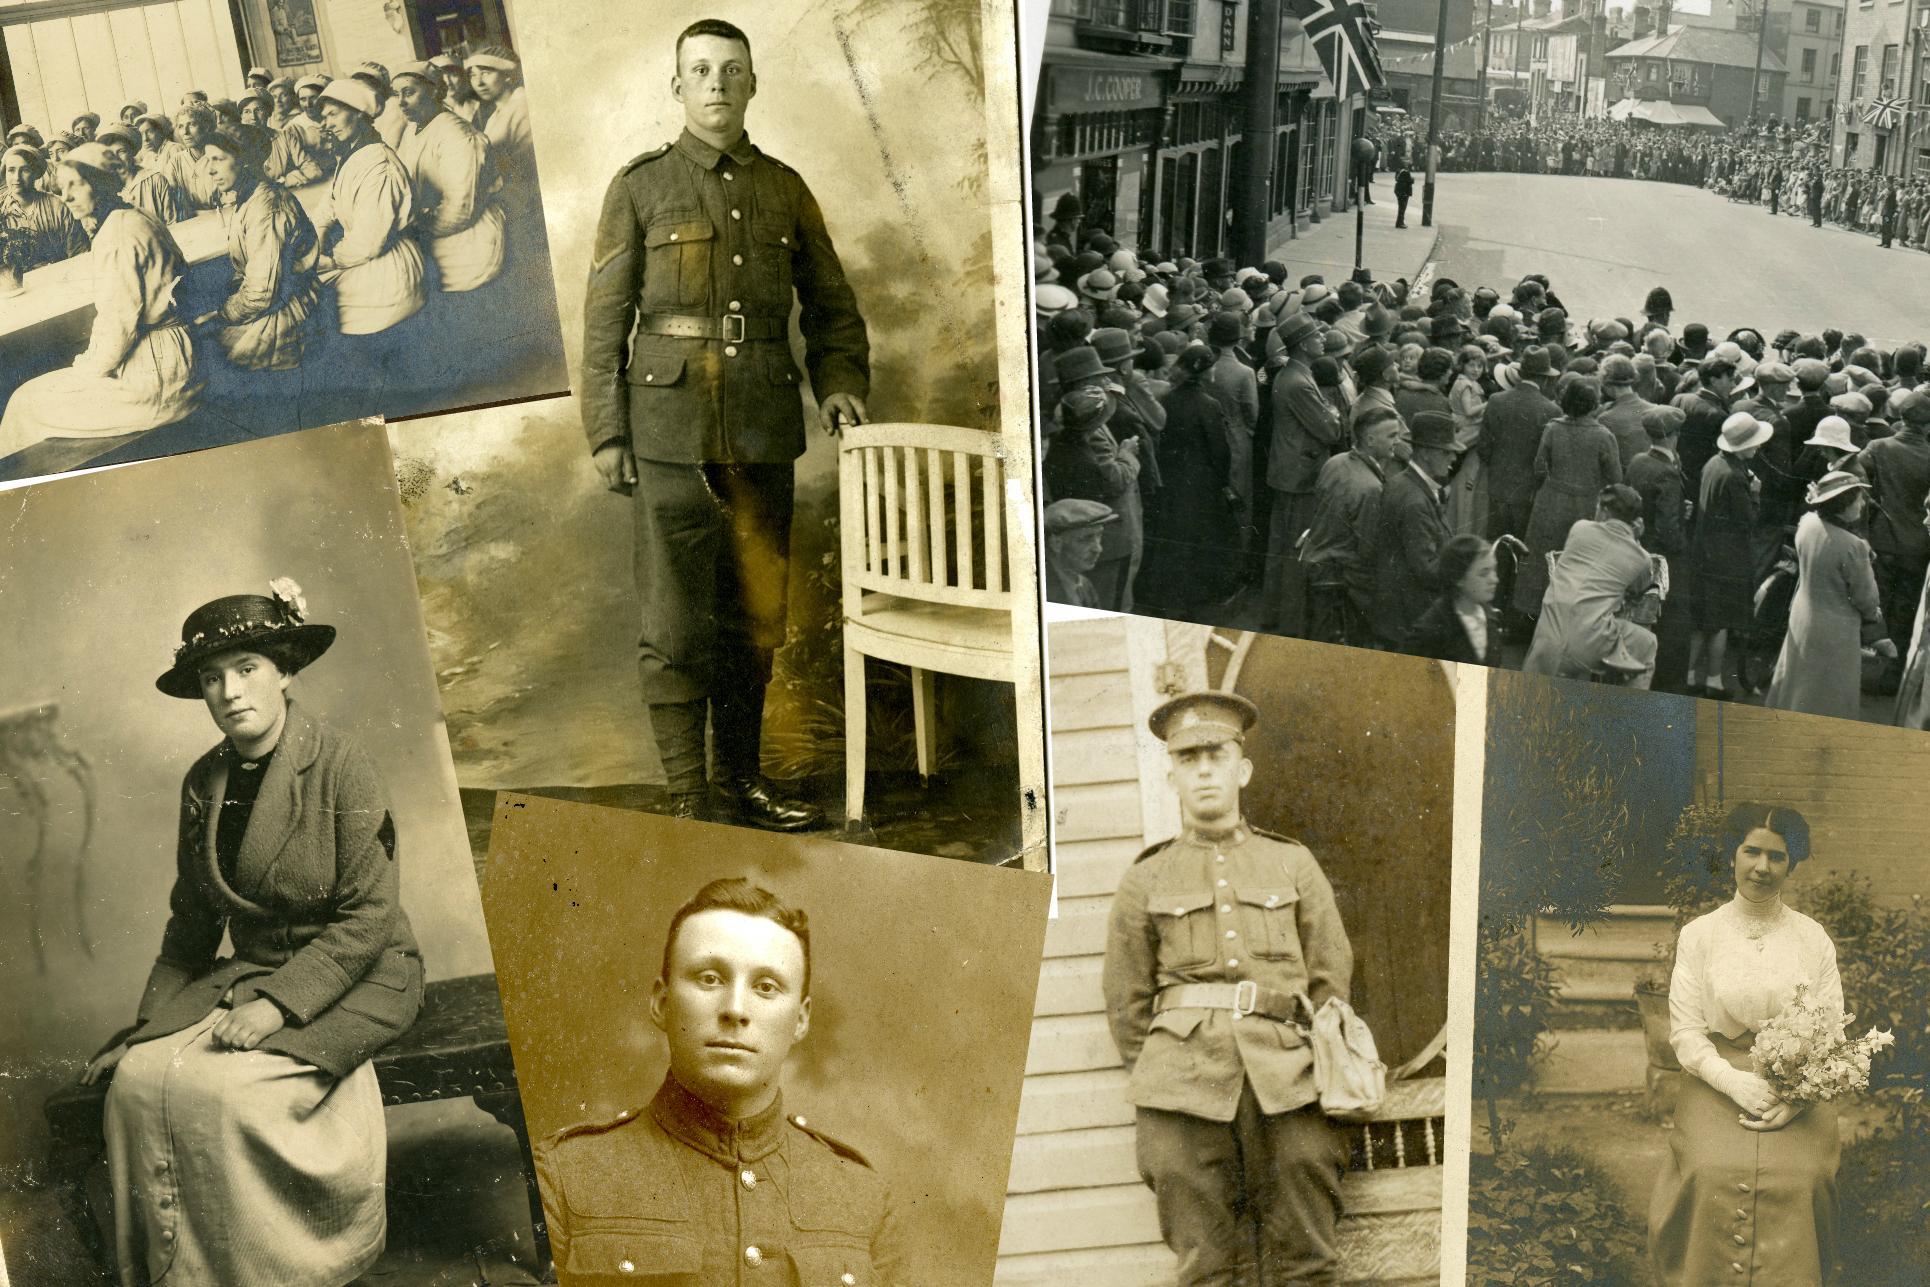 Ipswich and the Armistice